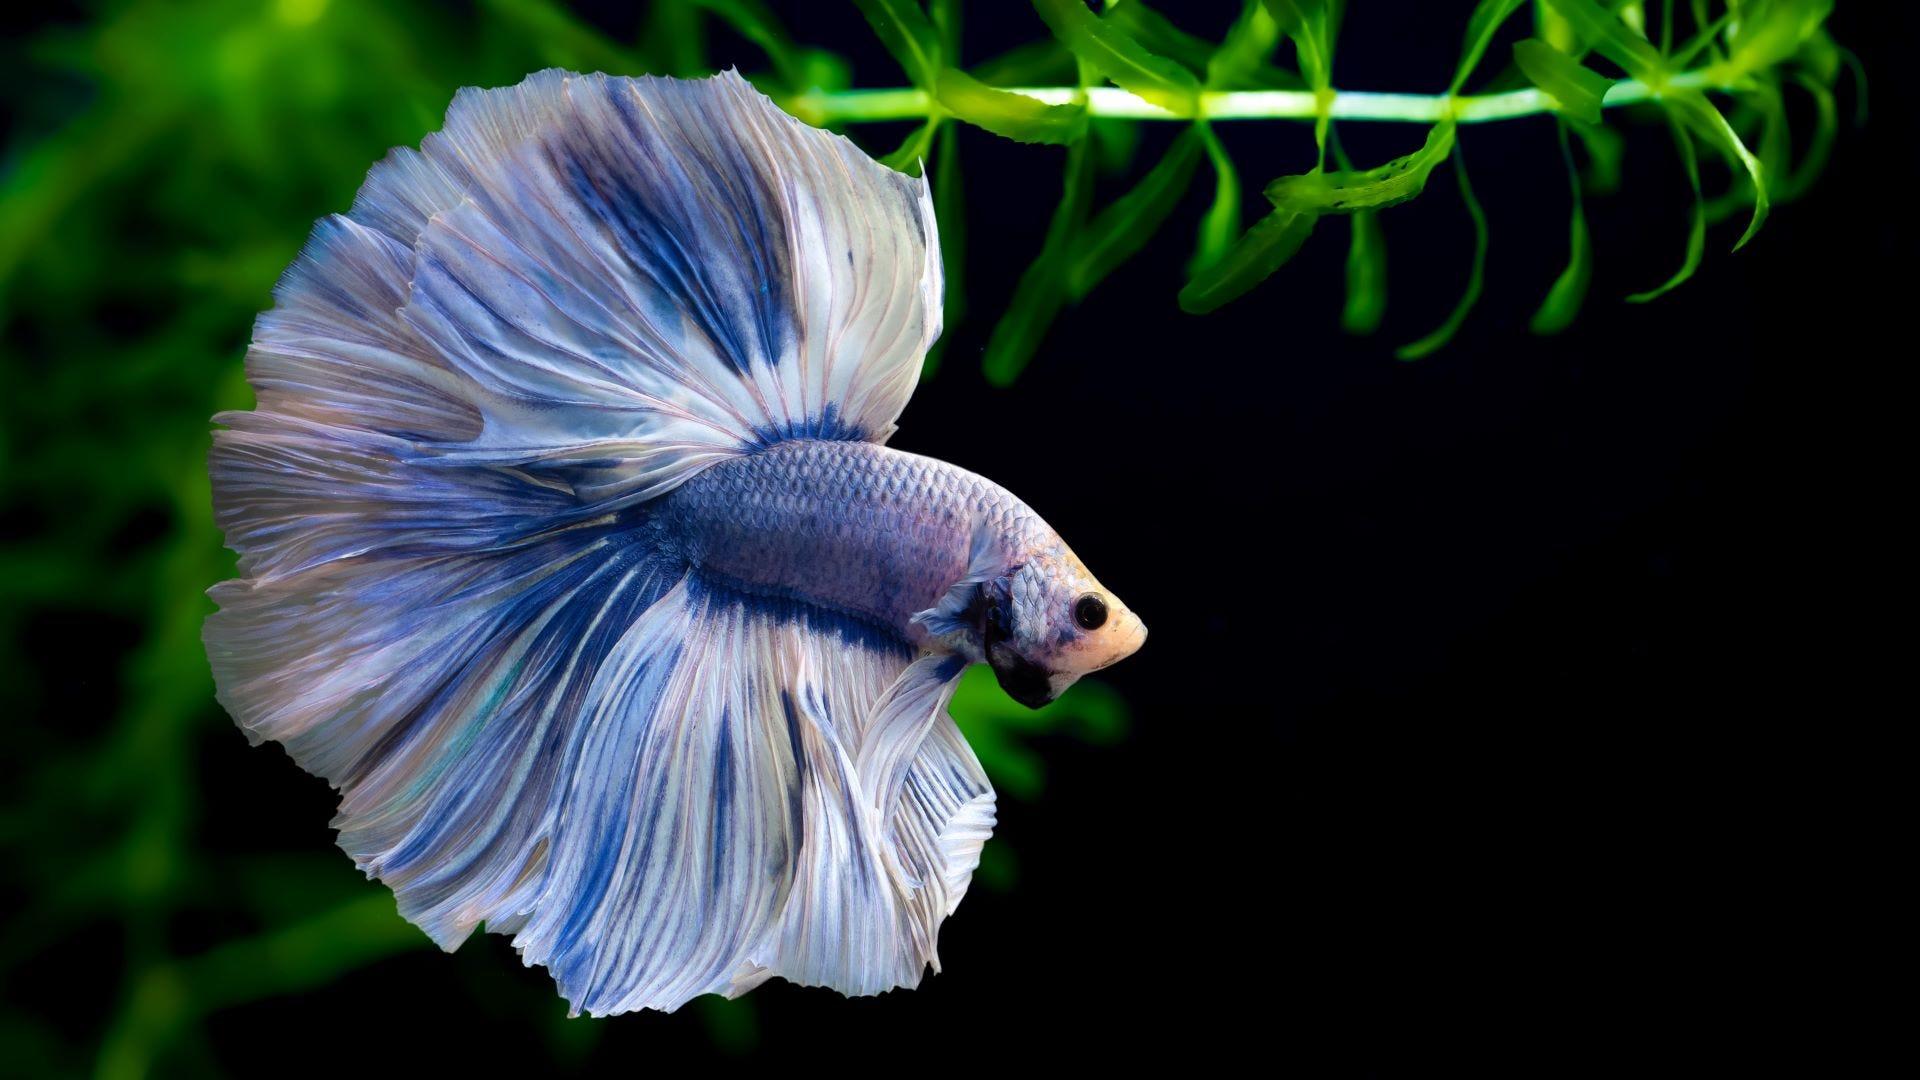 A blue half-moon betta fish.